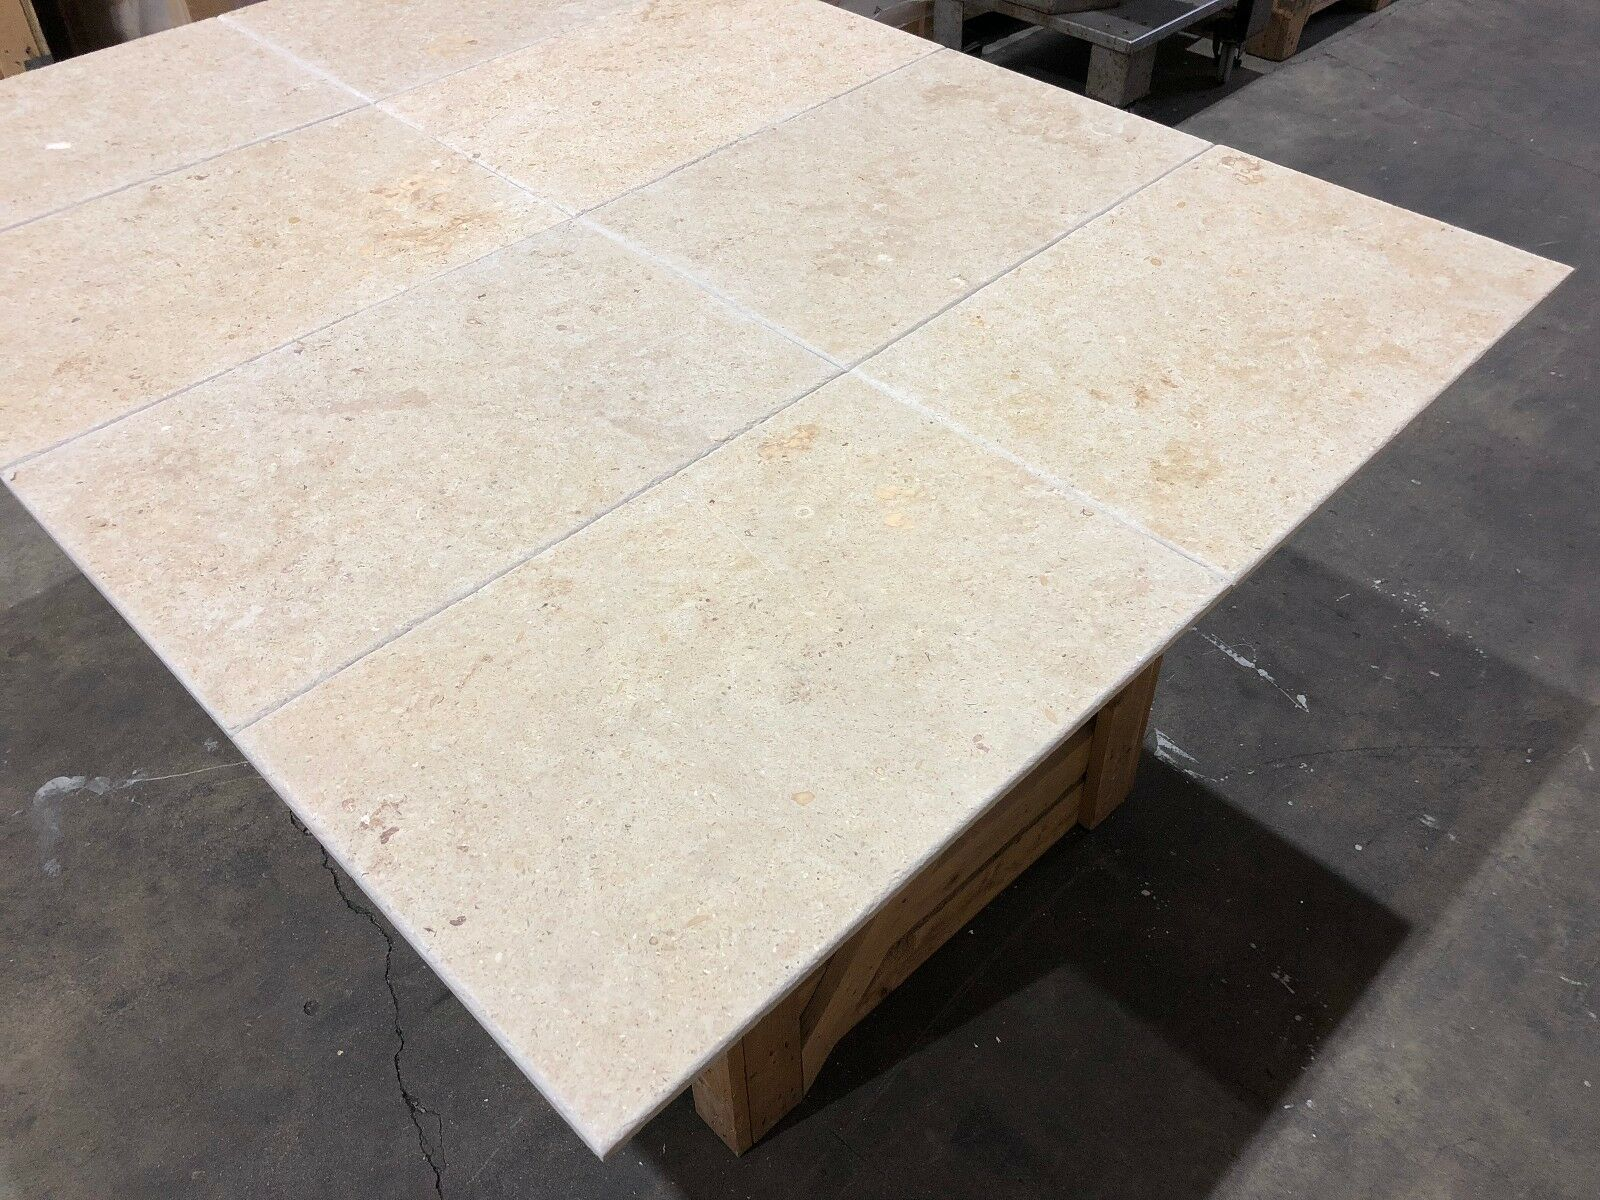 Jura Bone Limestone tiles, Honed Jura Bone Floor Wall Tiles, Marble 406x610x12mm